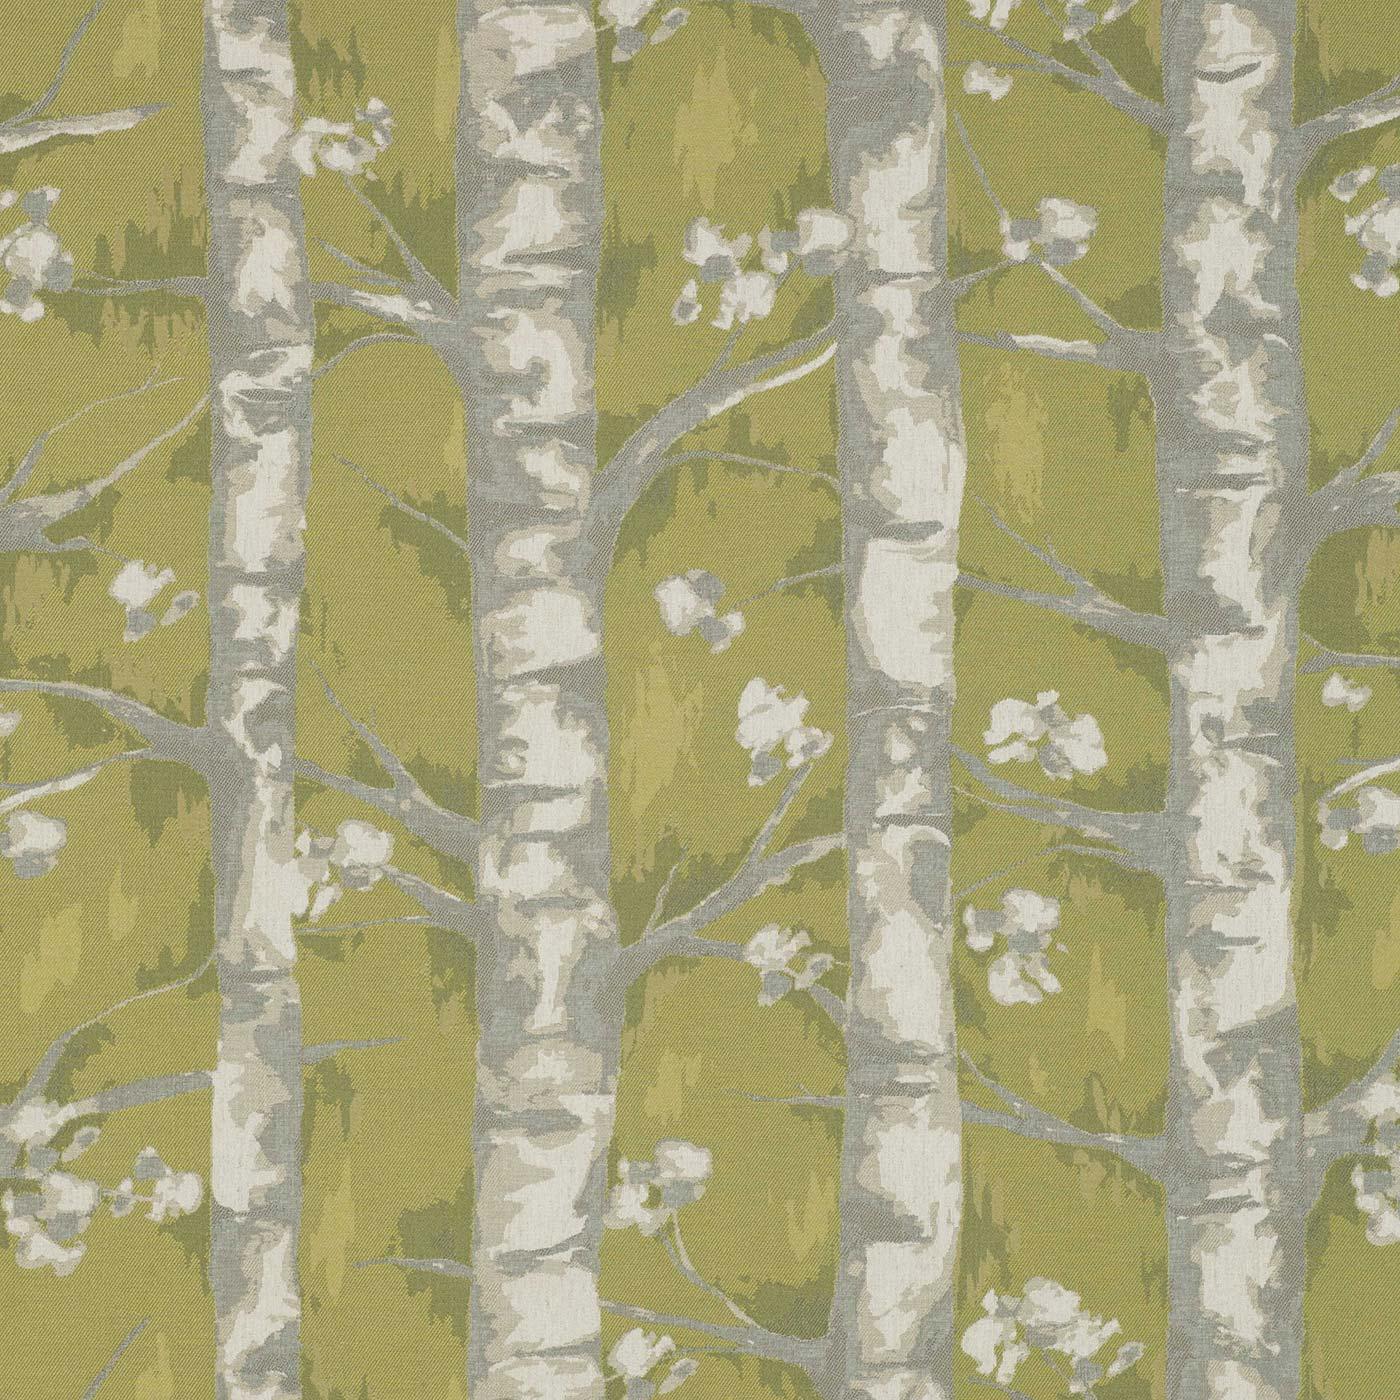 Windermere Lemongrass